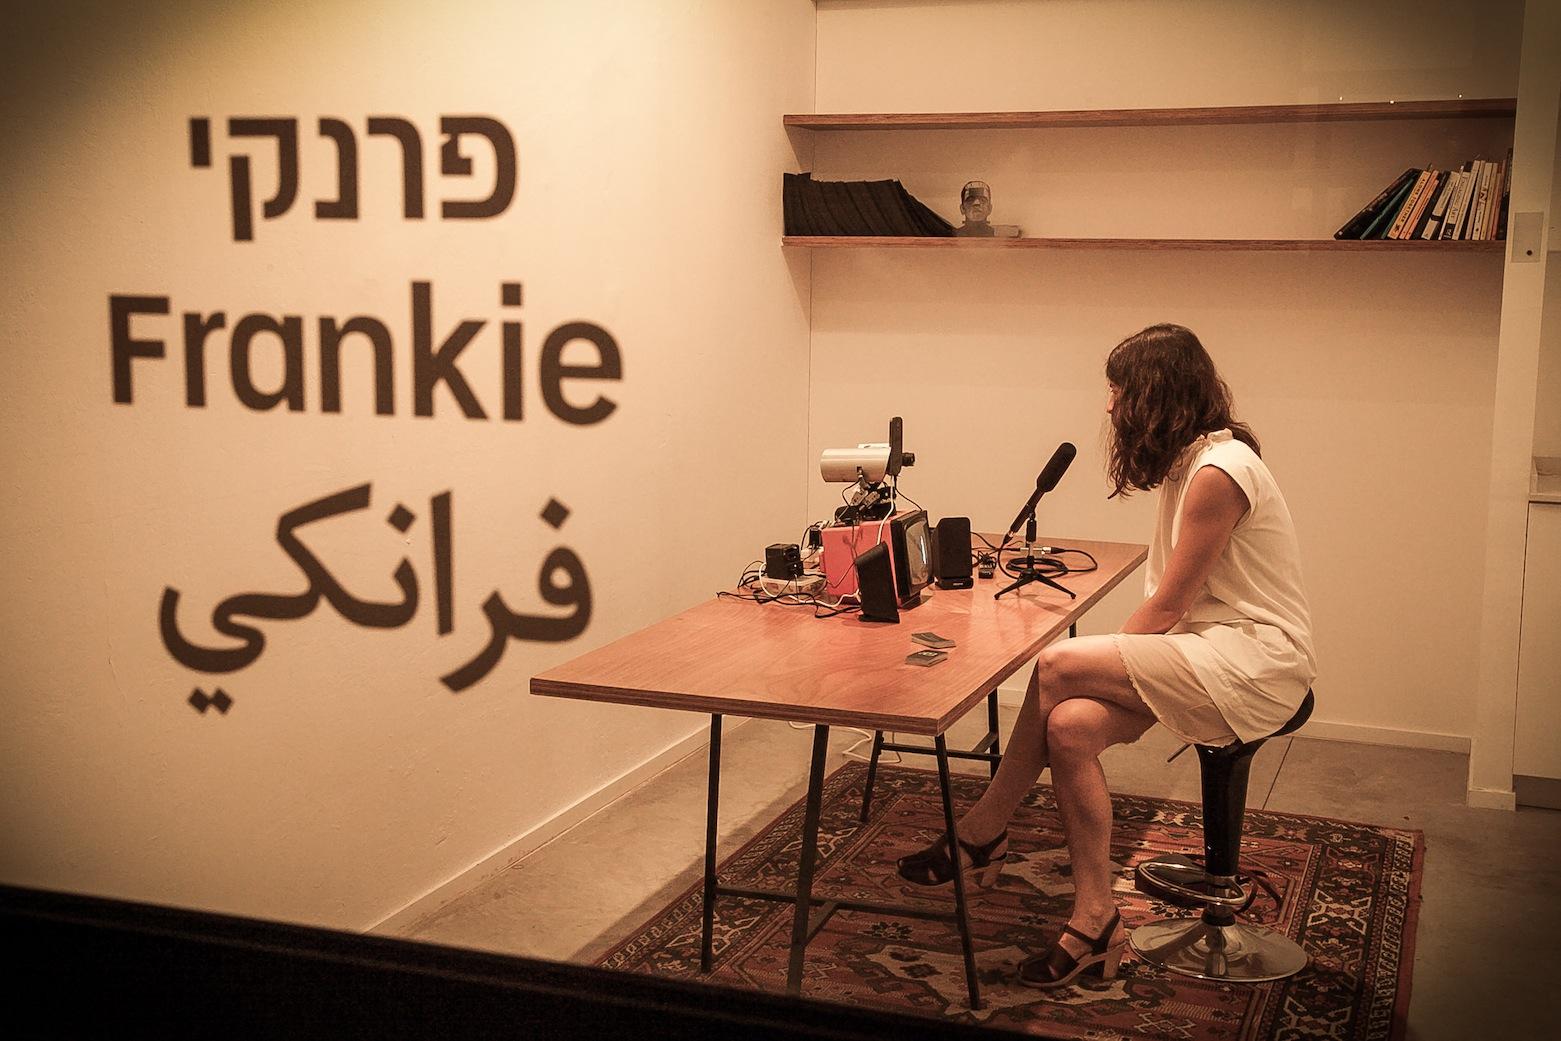 Frankie.jpg